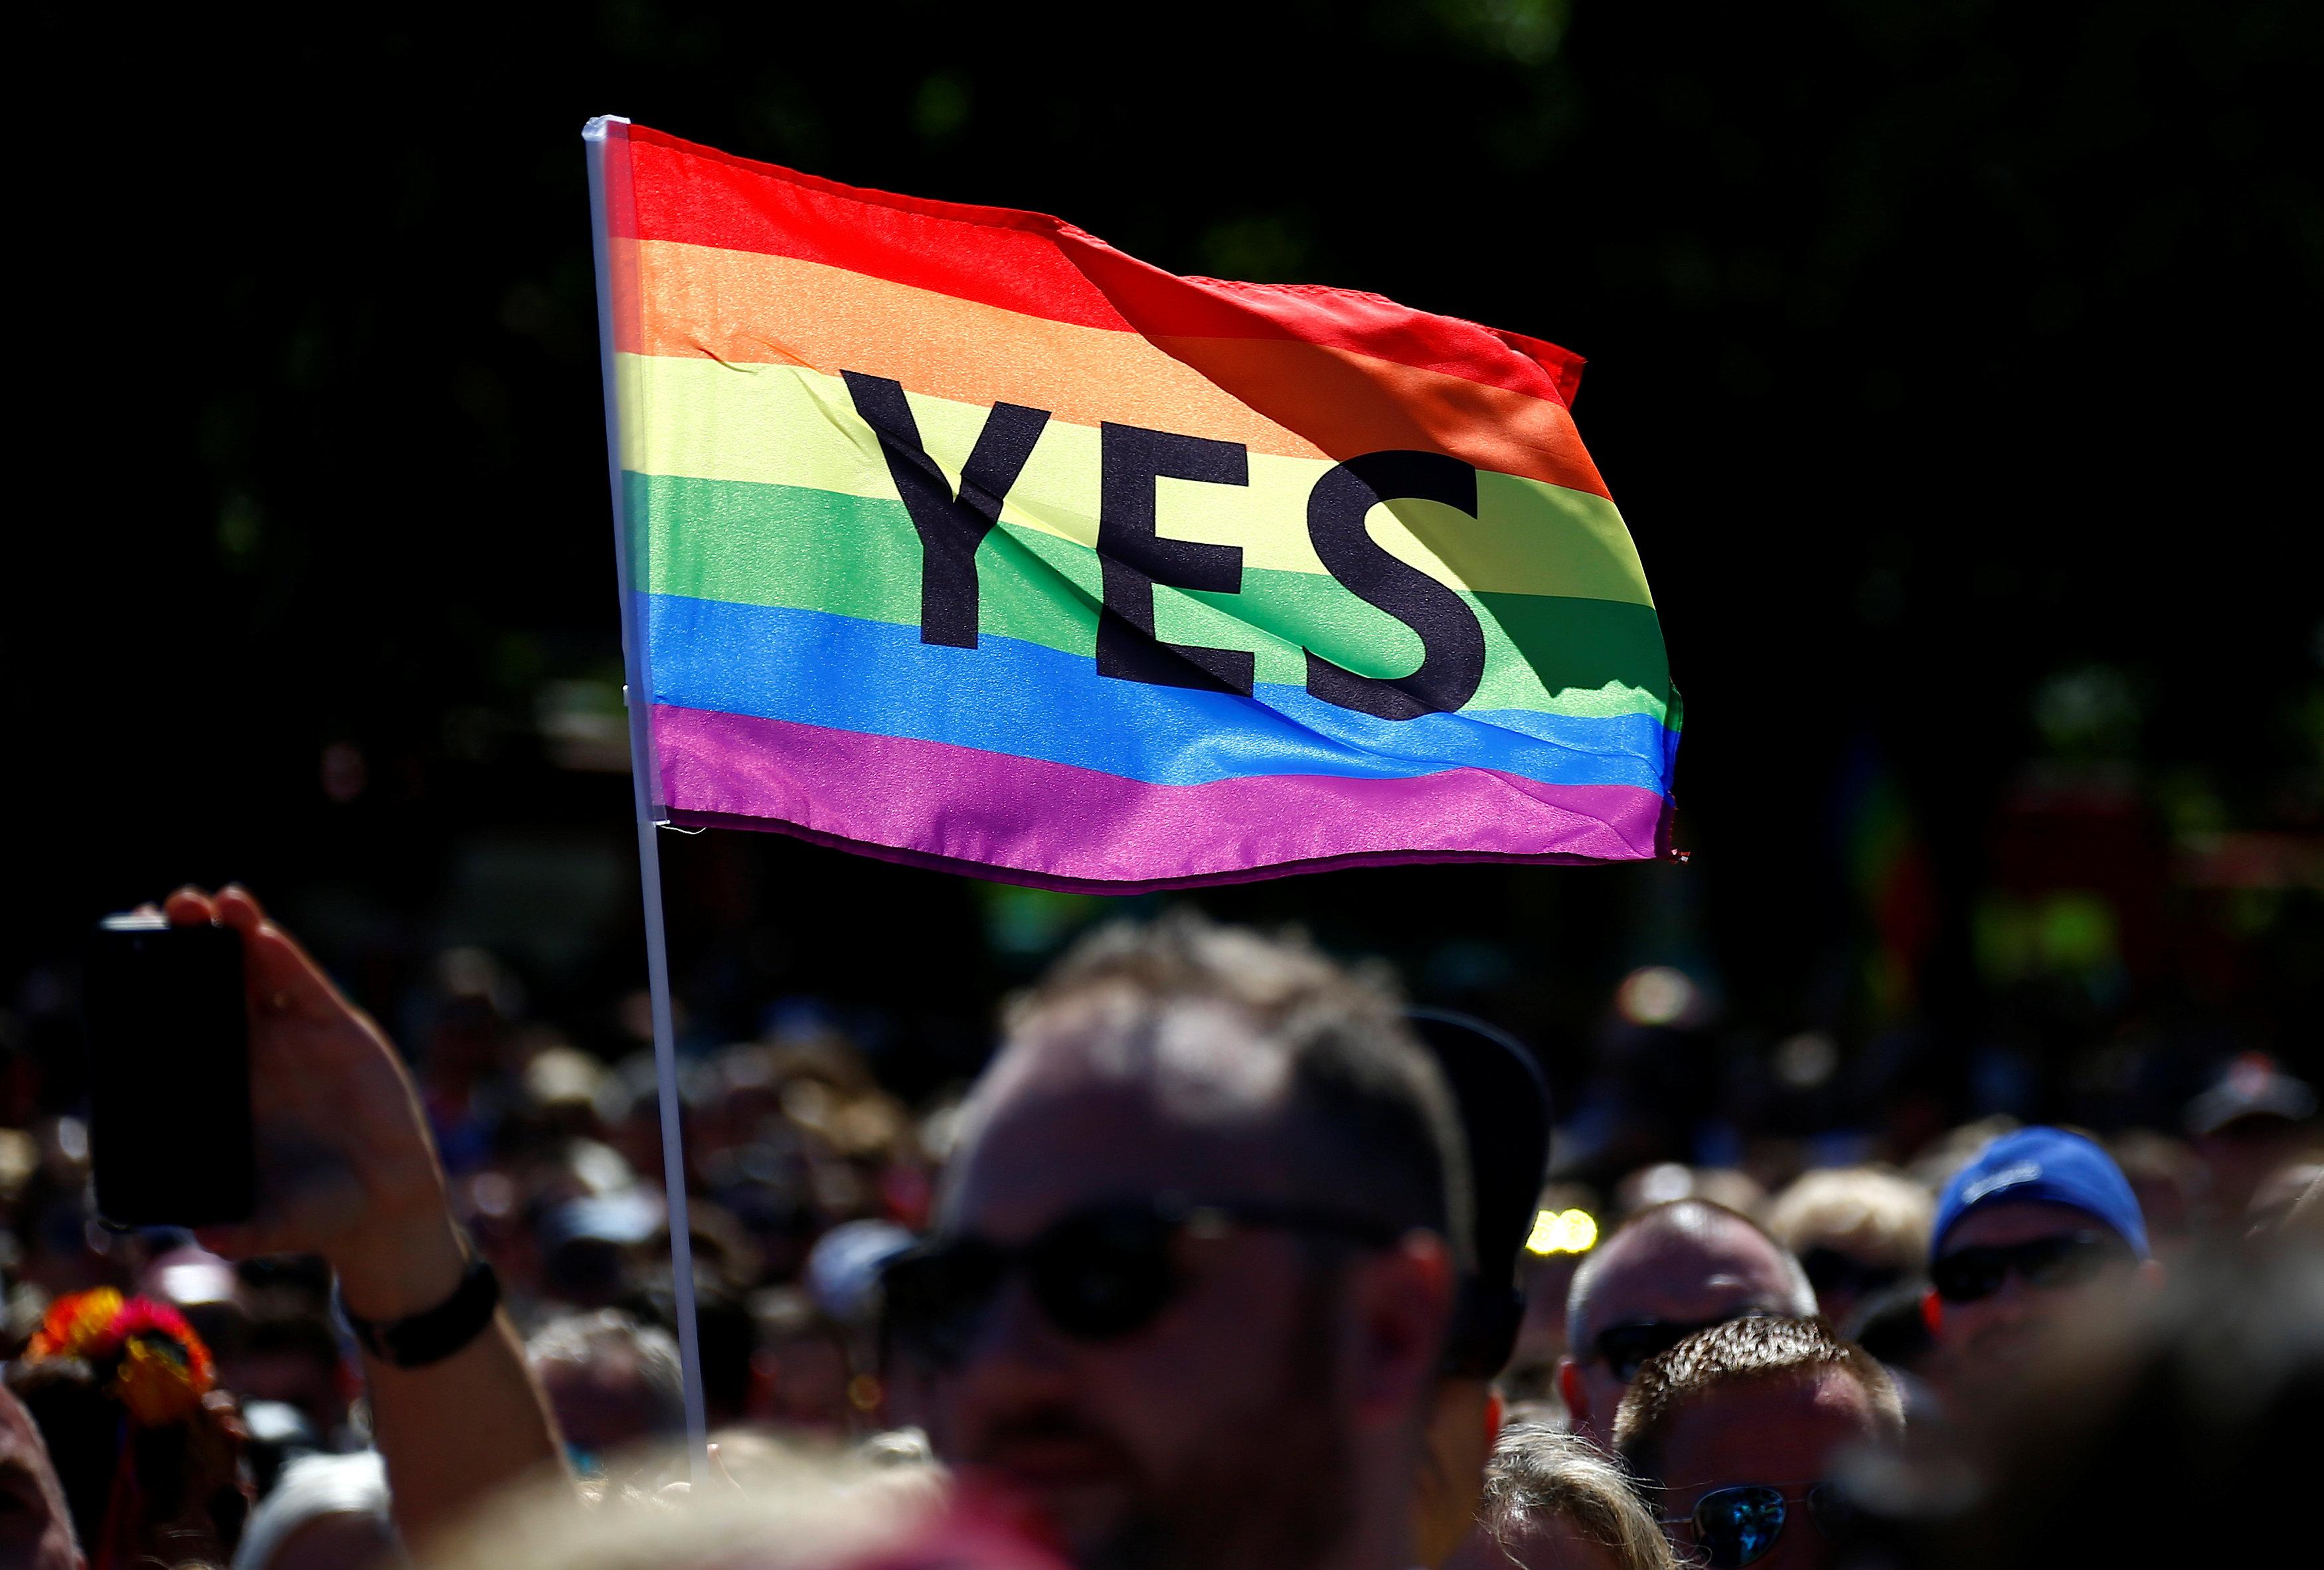 Australia le dice 'sí' al matrimonio homosexual